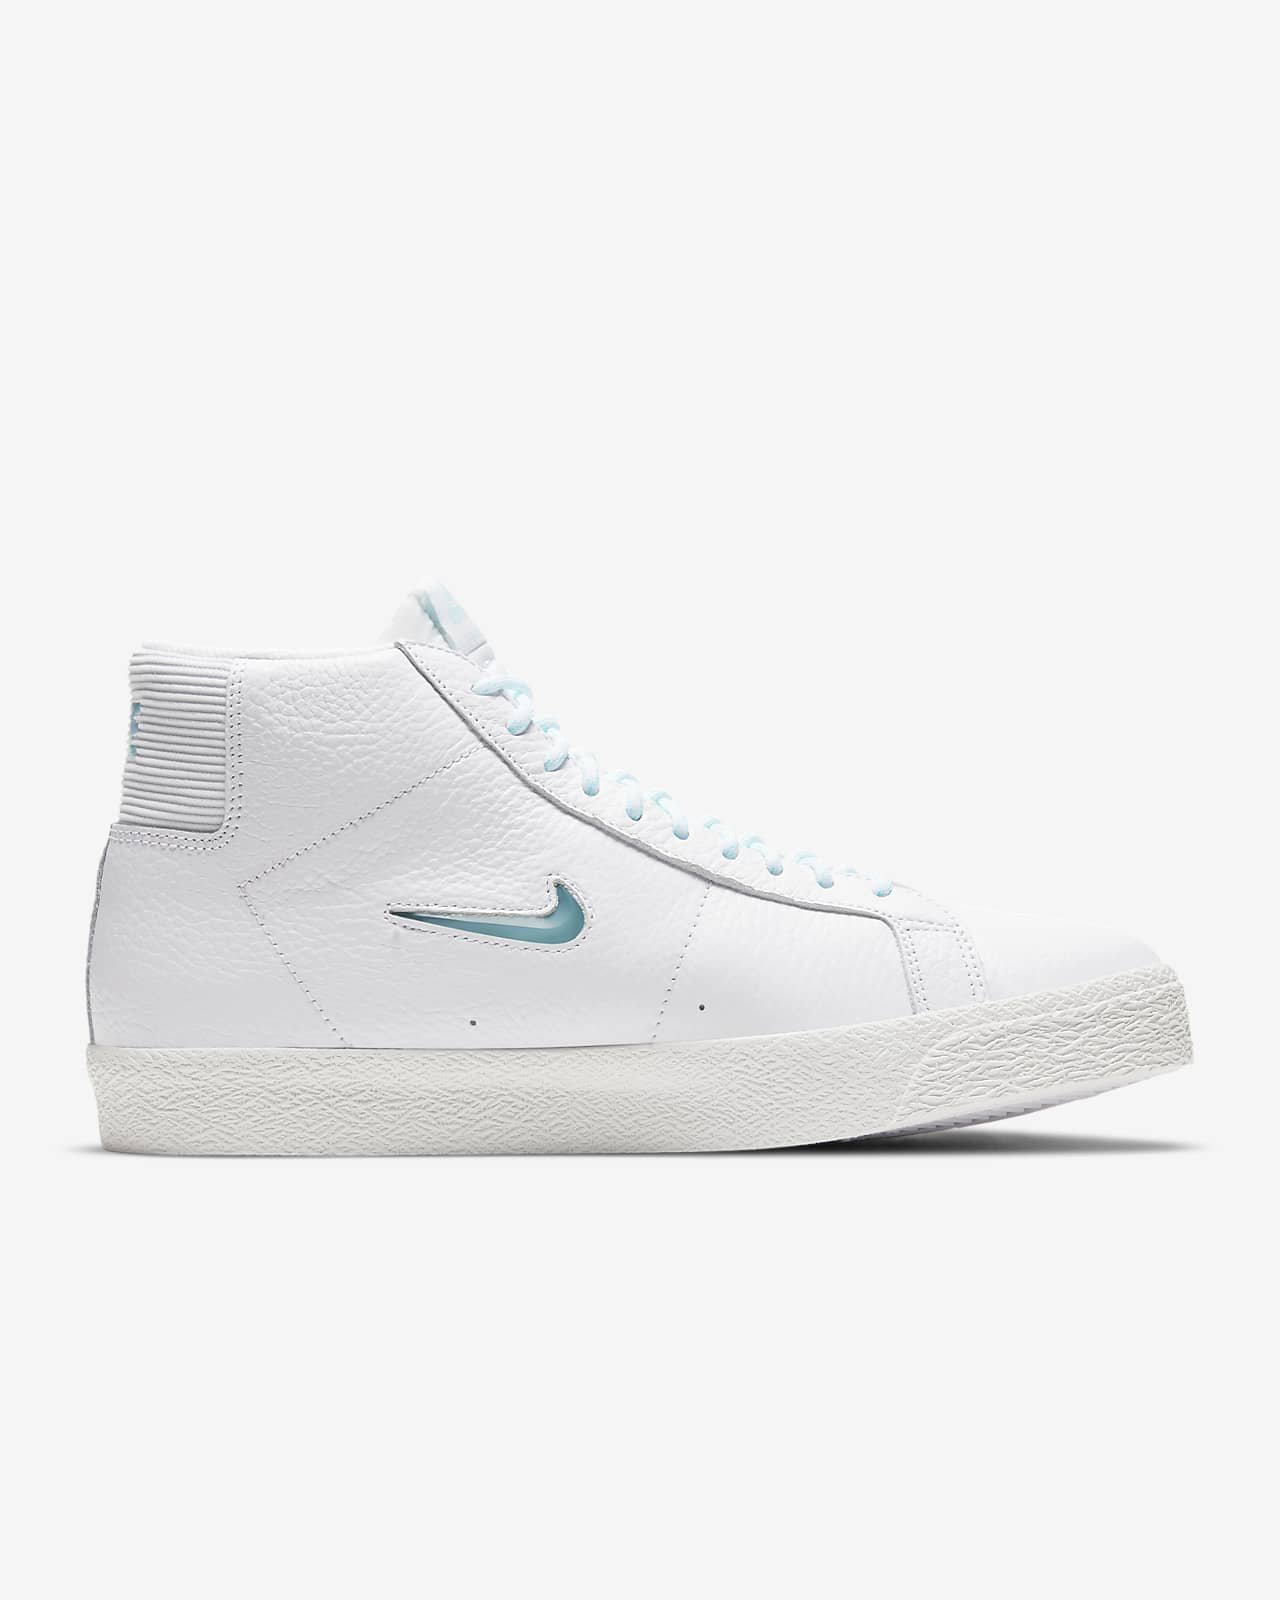 Nike SB Blazer Mid Premium White/White/Summit White/Glacier Ice